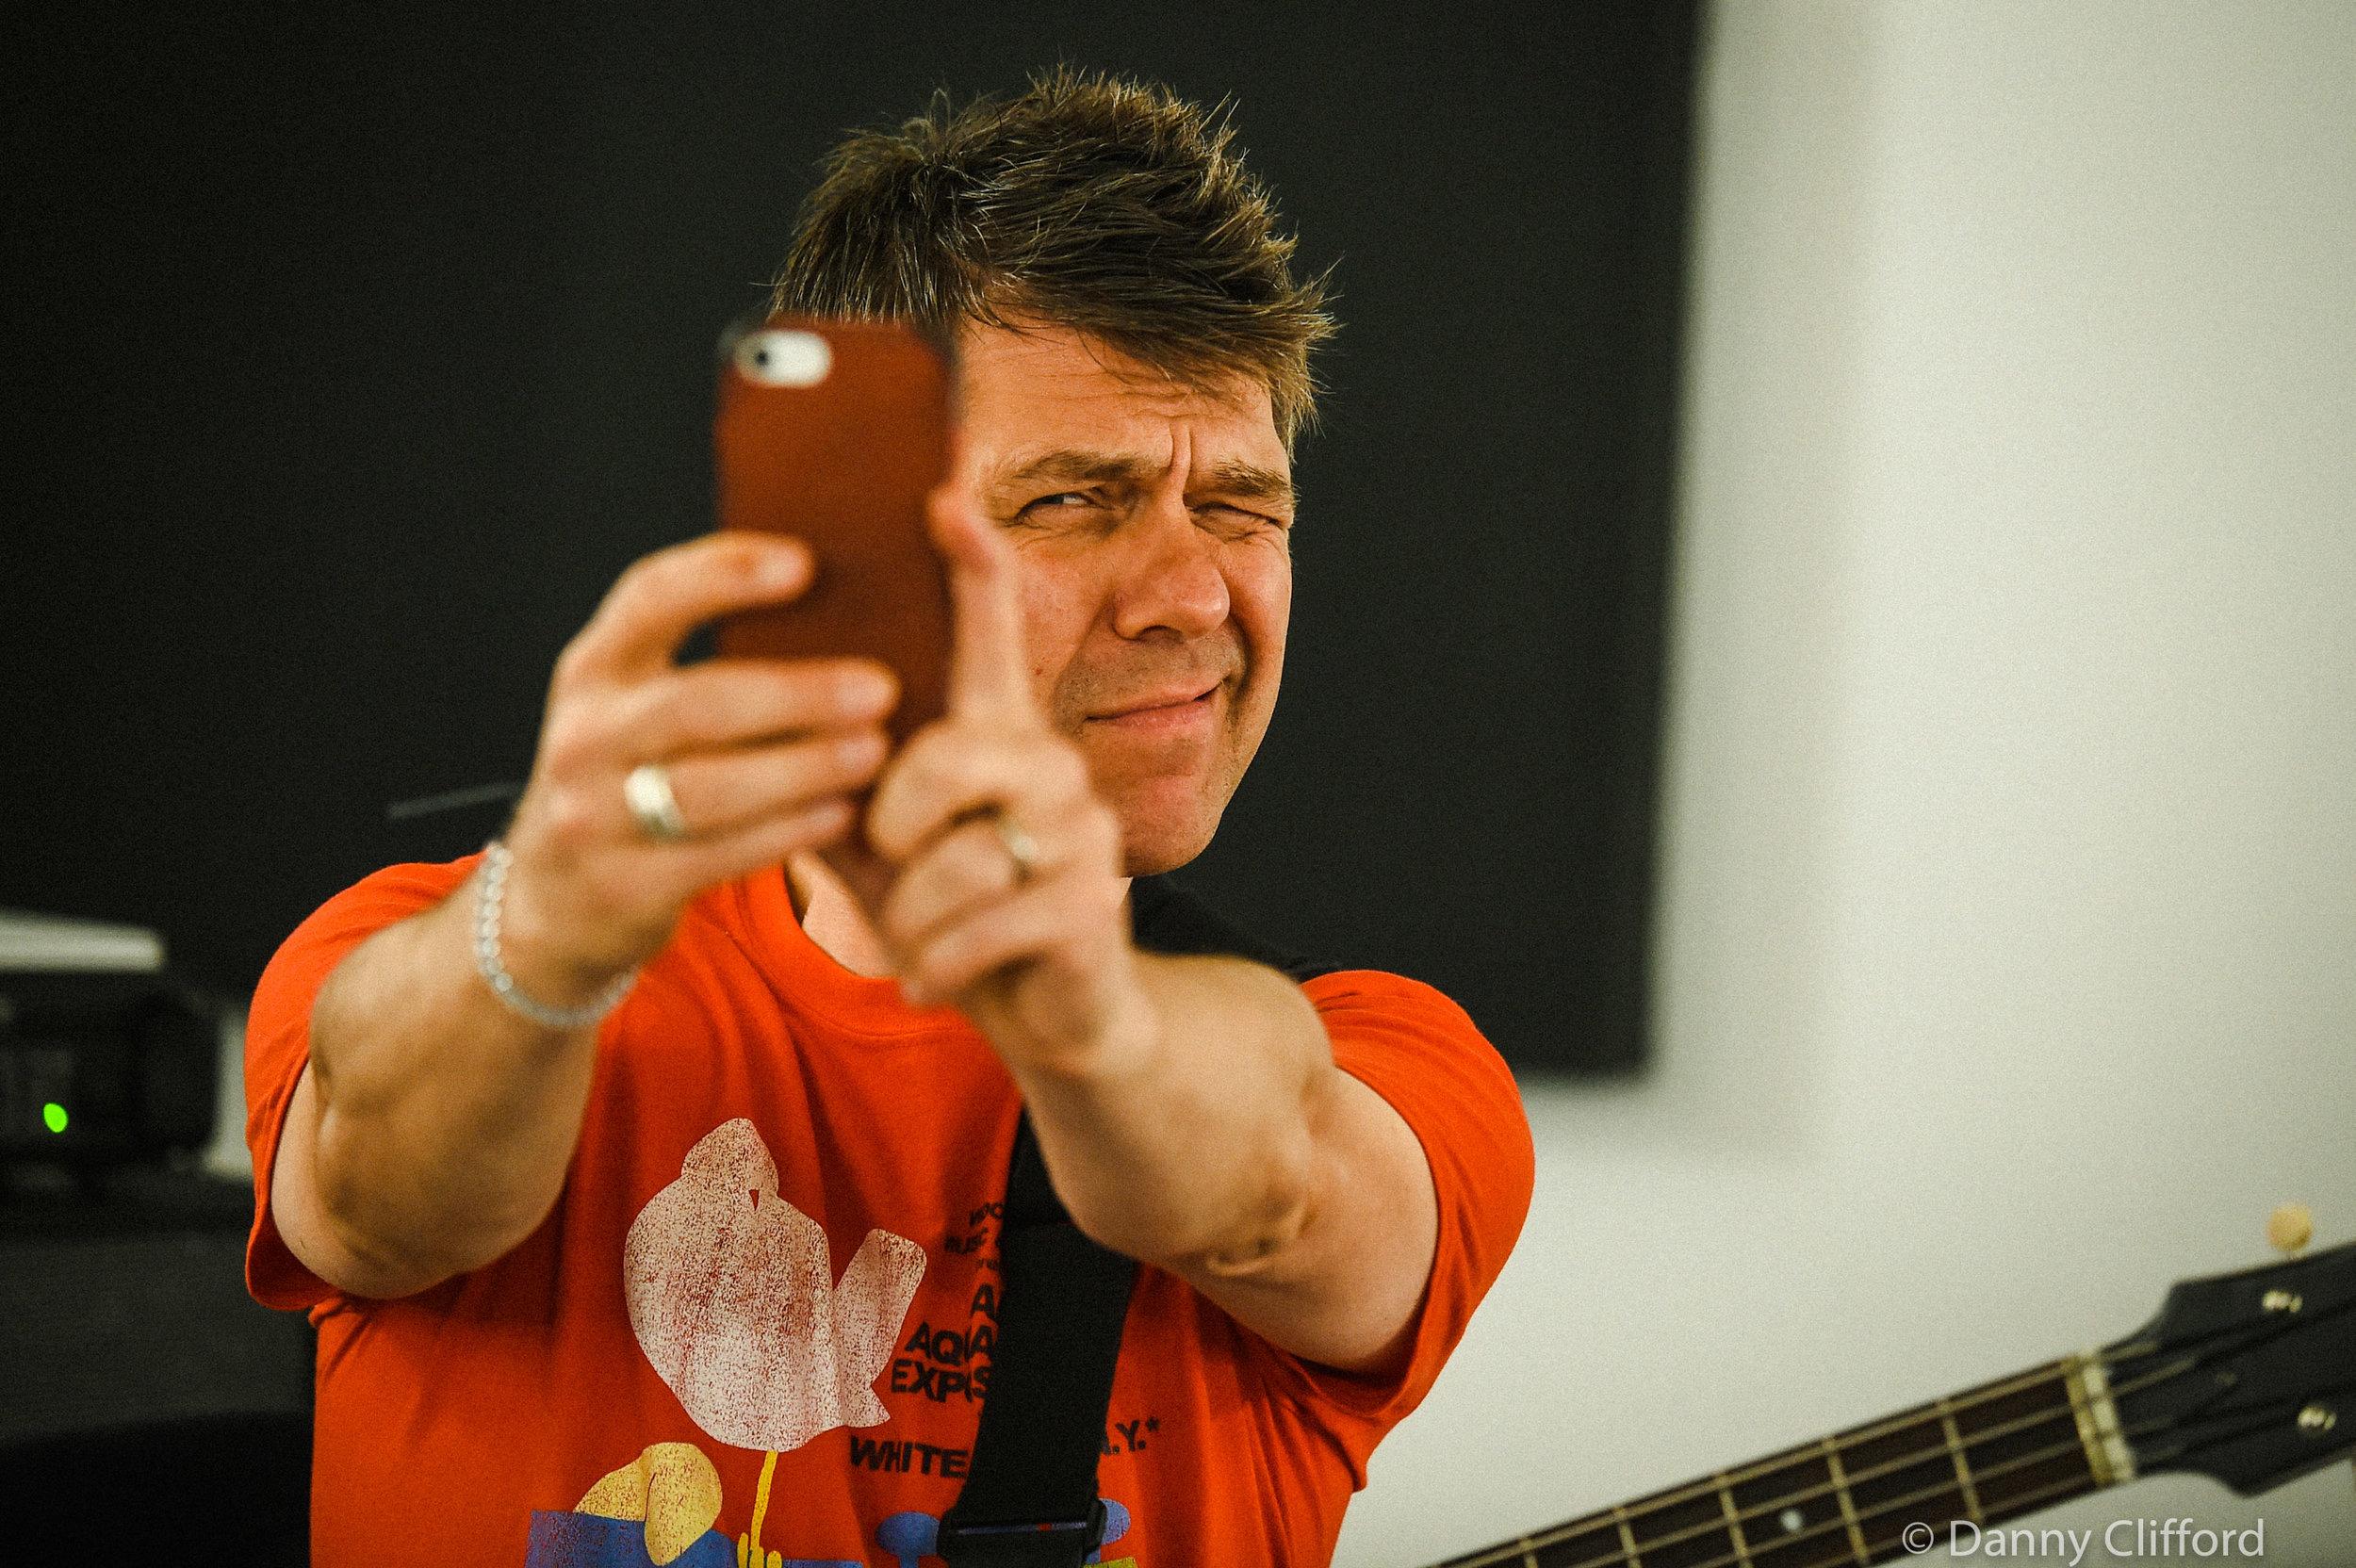 Stefan taking a picture of me? No. it was a selfie.